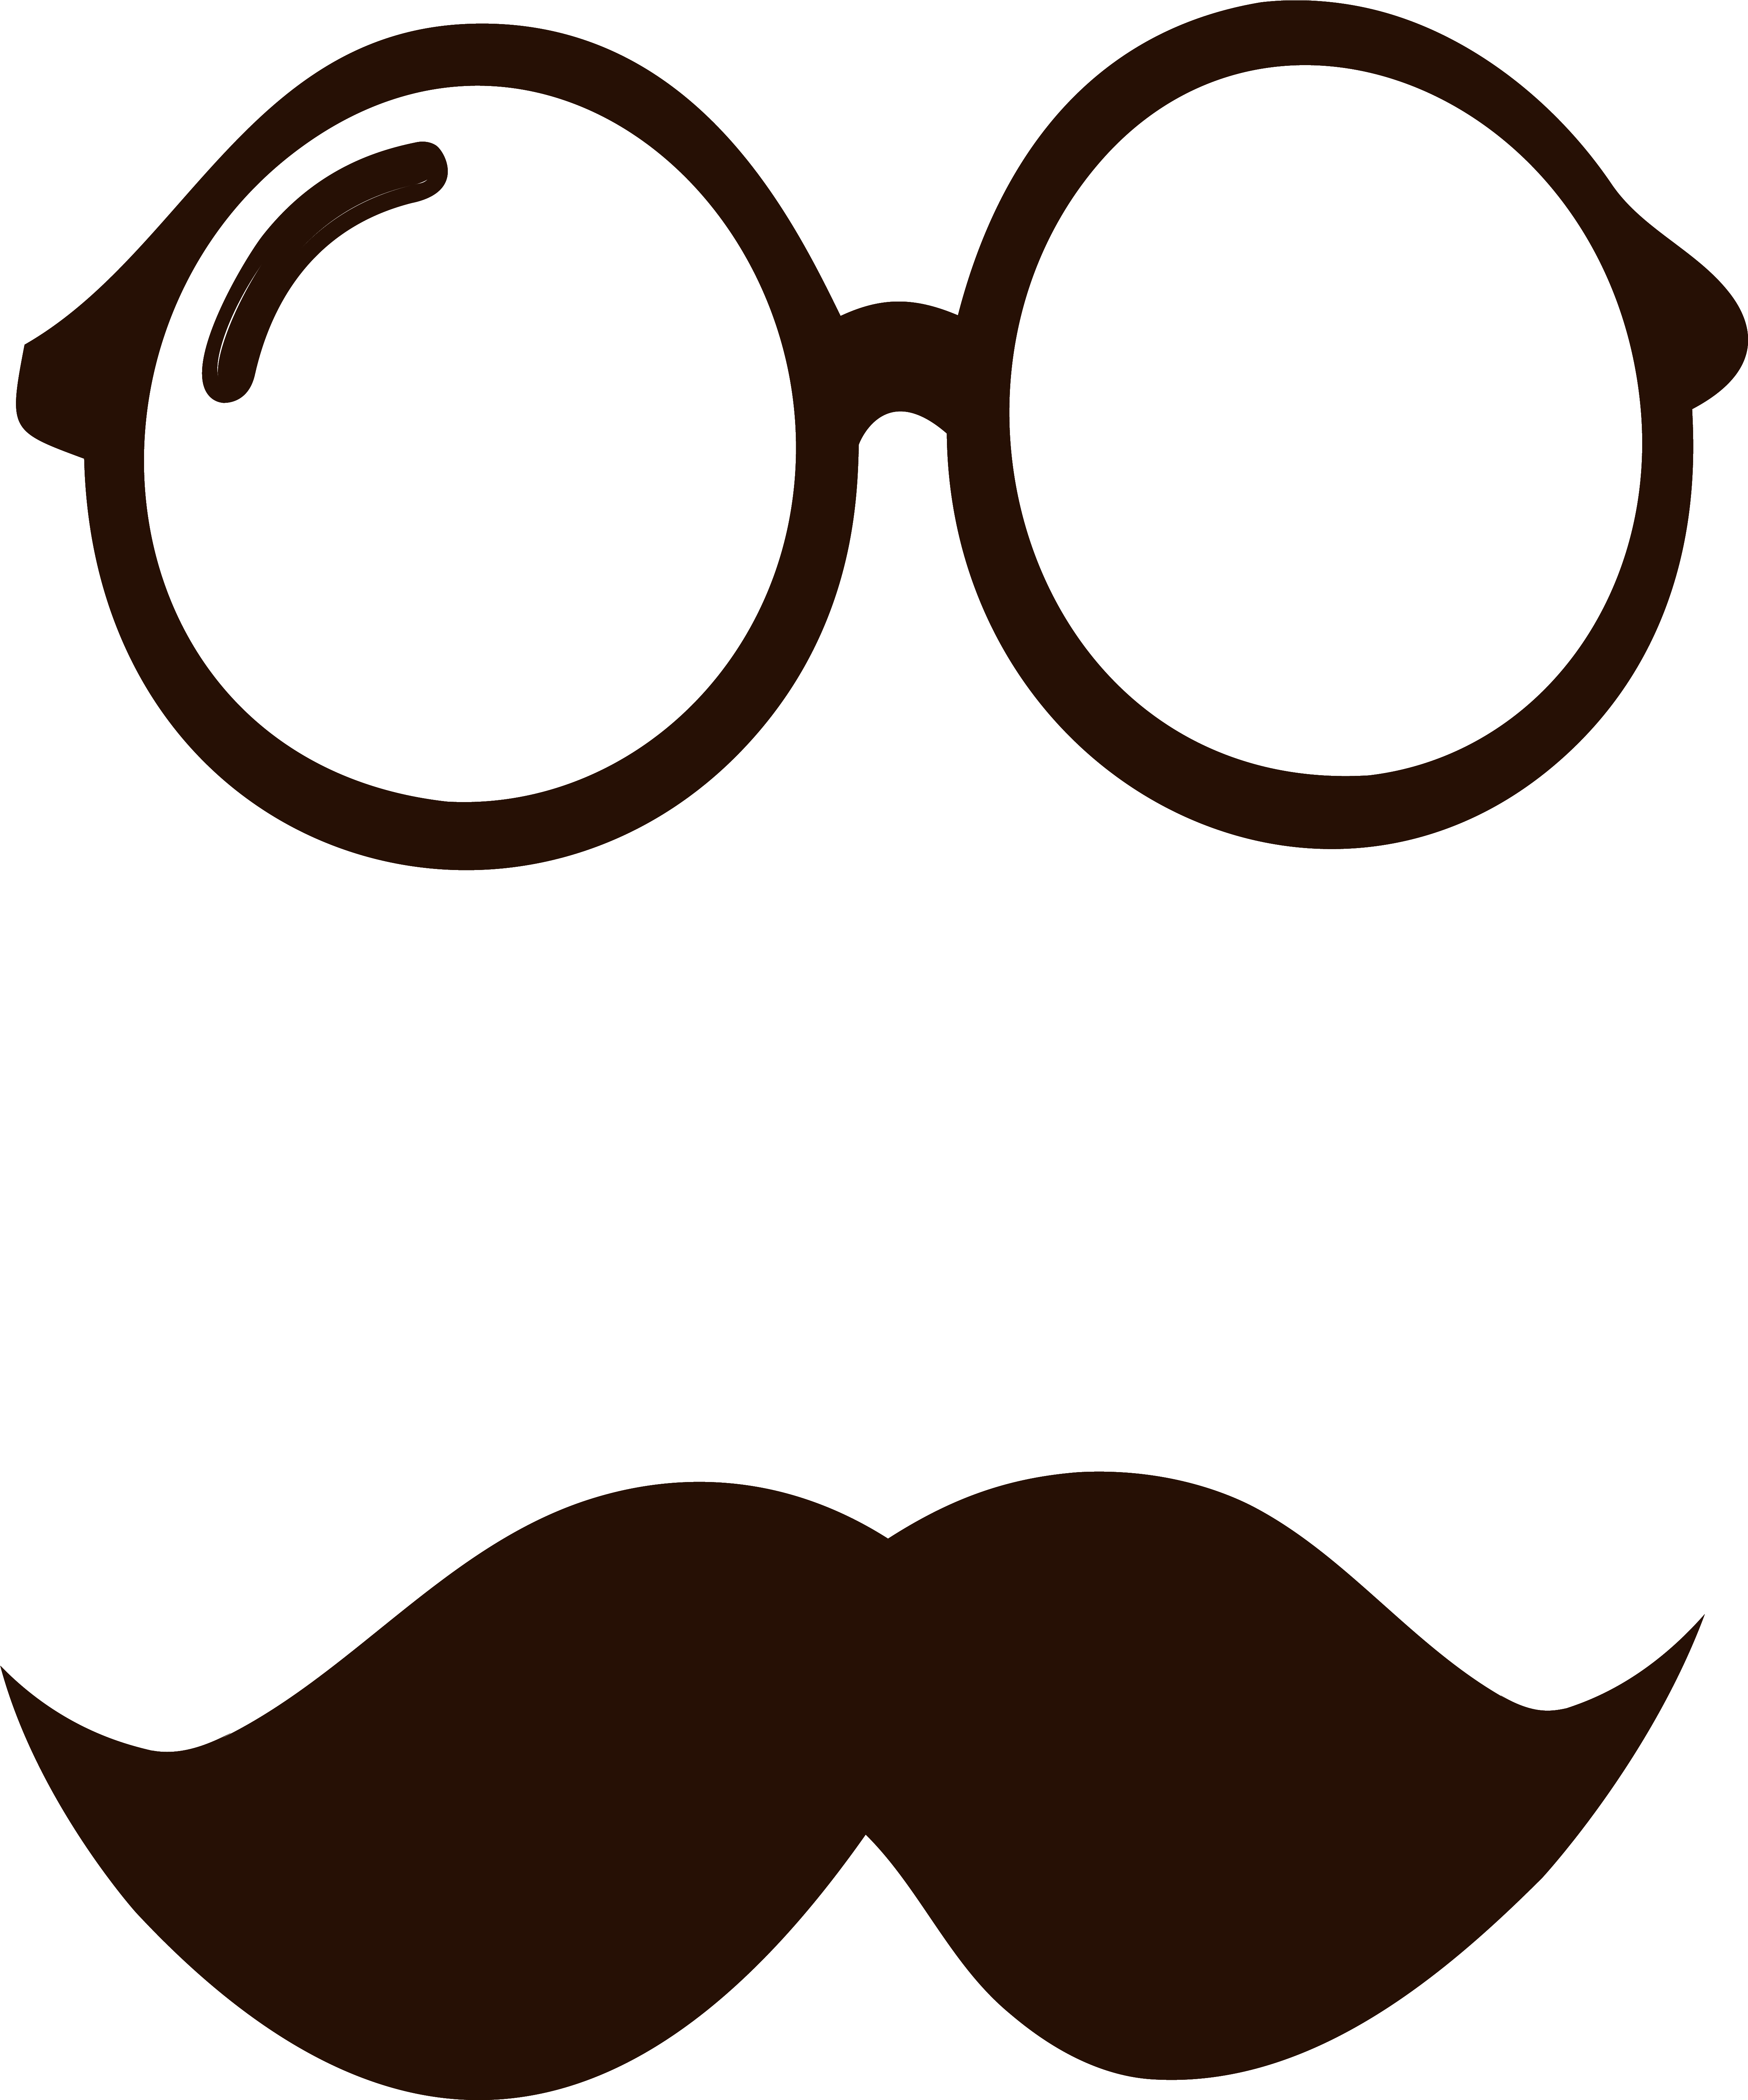 Hd movember glasses and. Mustache clipart nerd glass